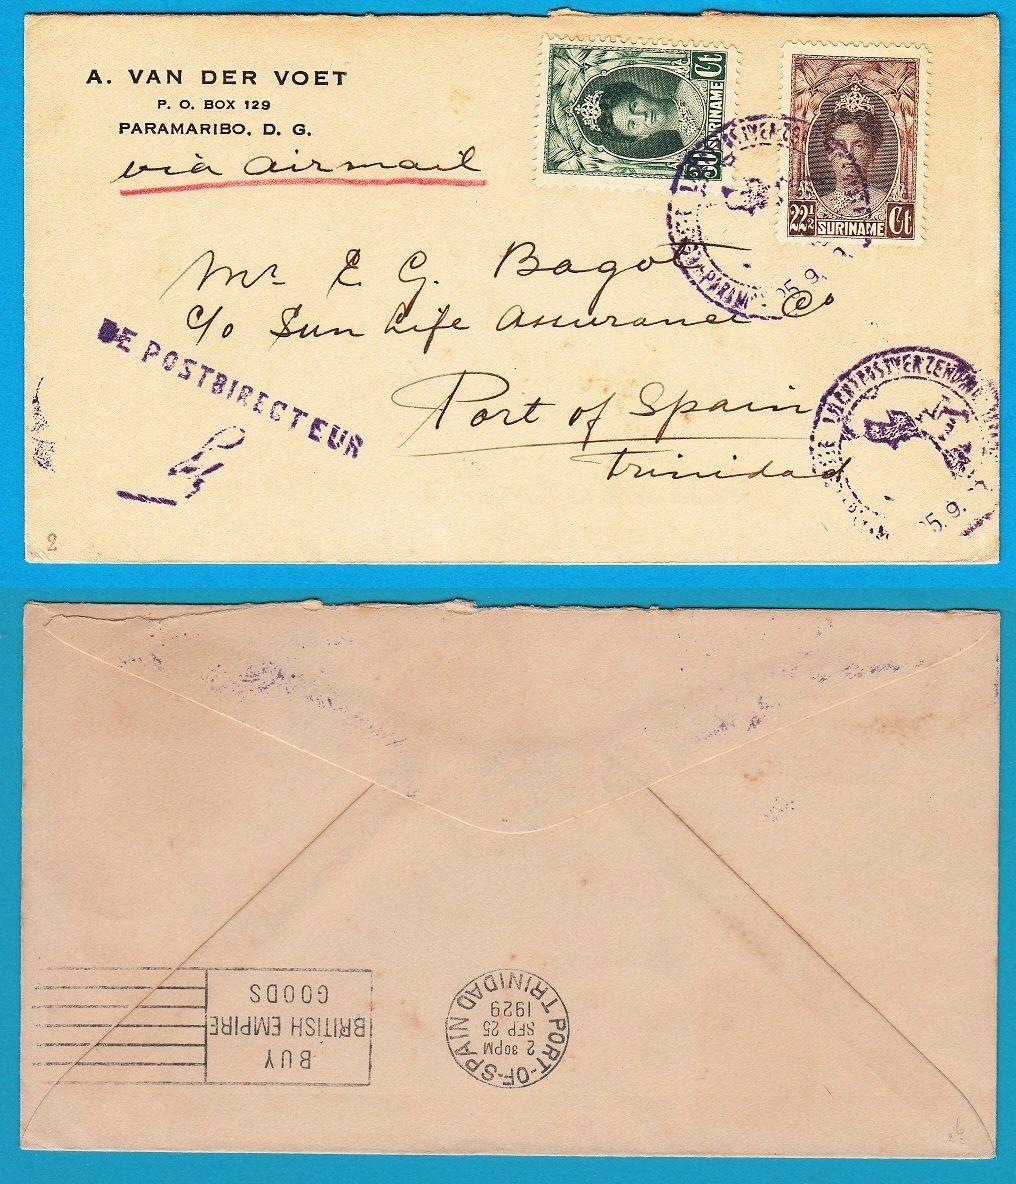 SURINAME Lindbergh flight 25-09-1929 to Trinidad